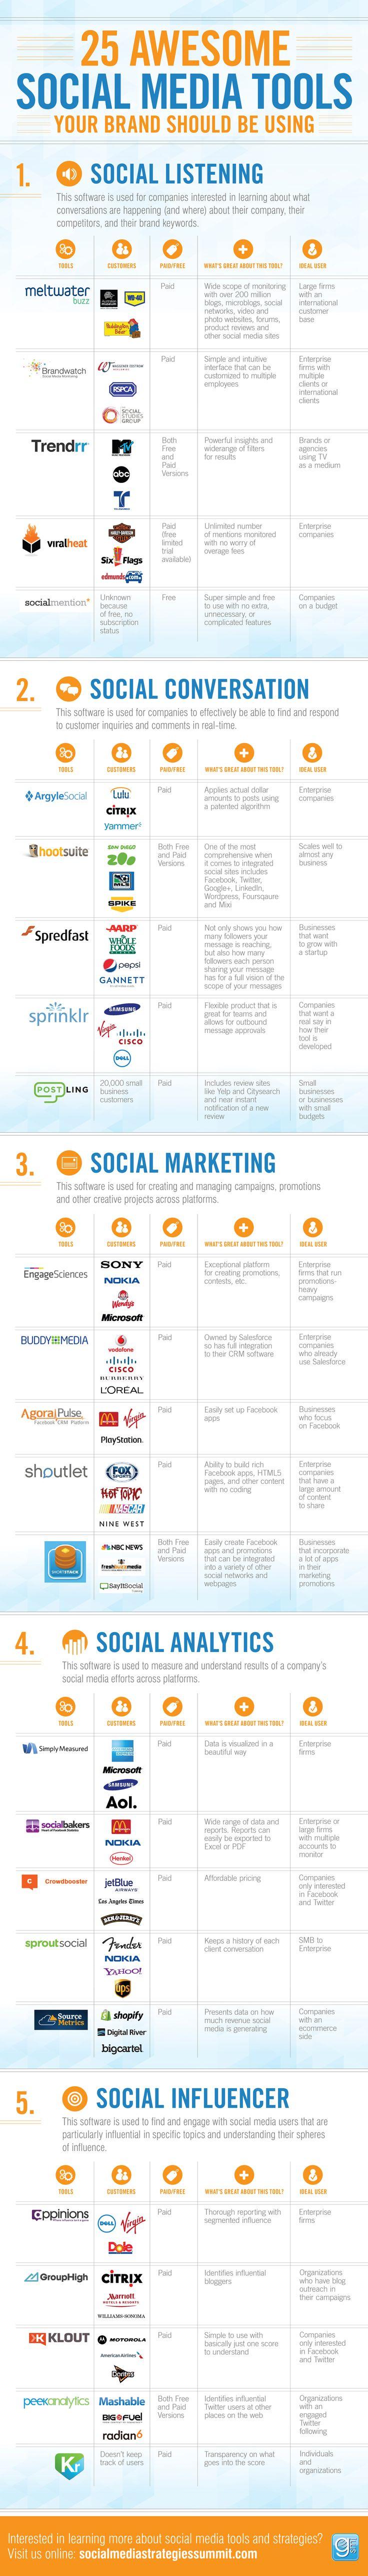 herramientas_social_media